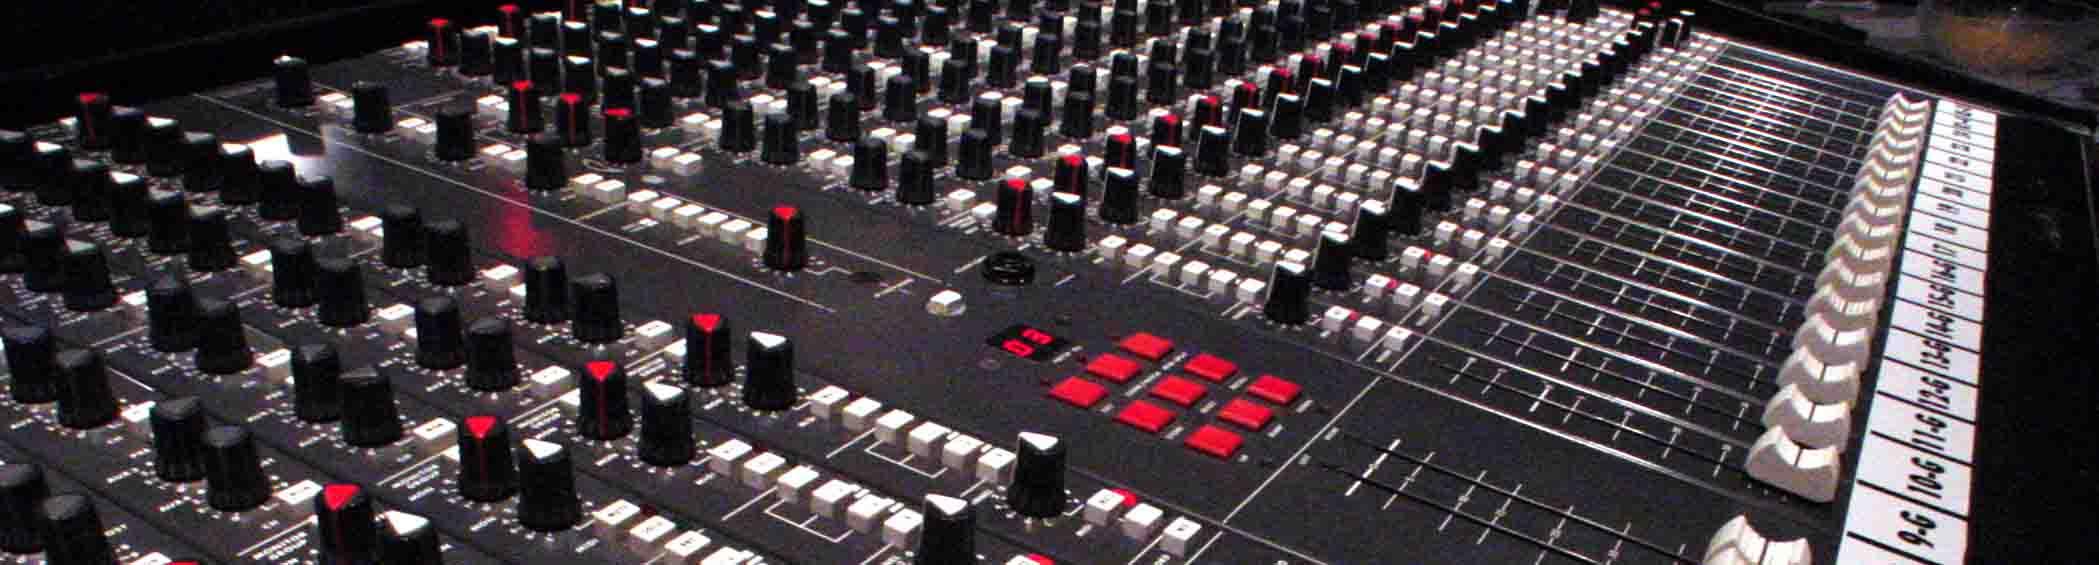 Seaview-Studio-Vocal-Recording-Folkestone-Kent